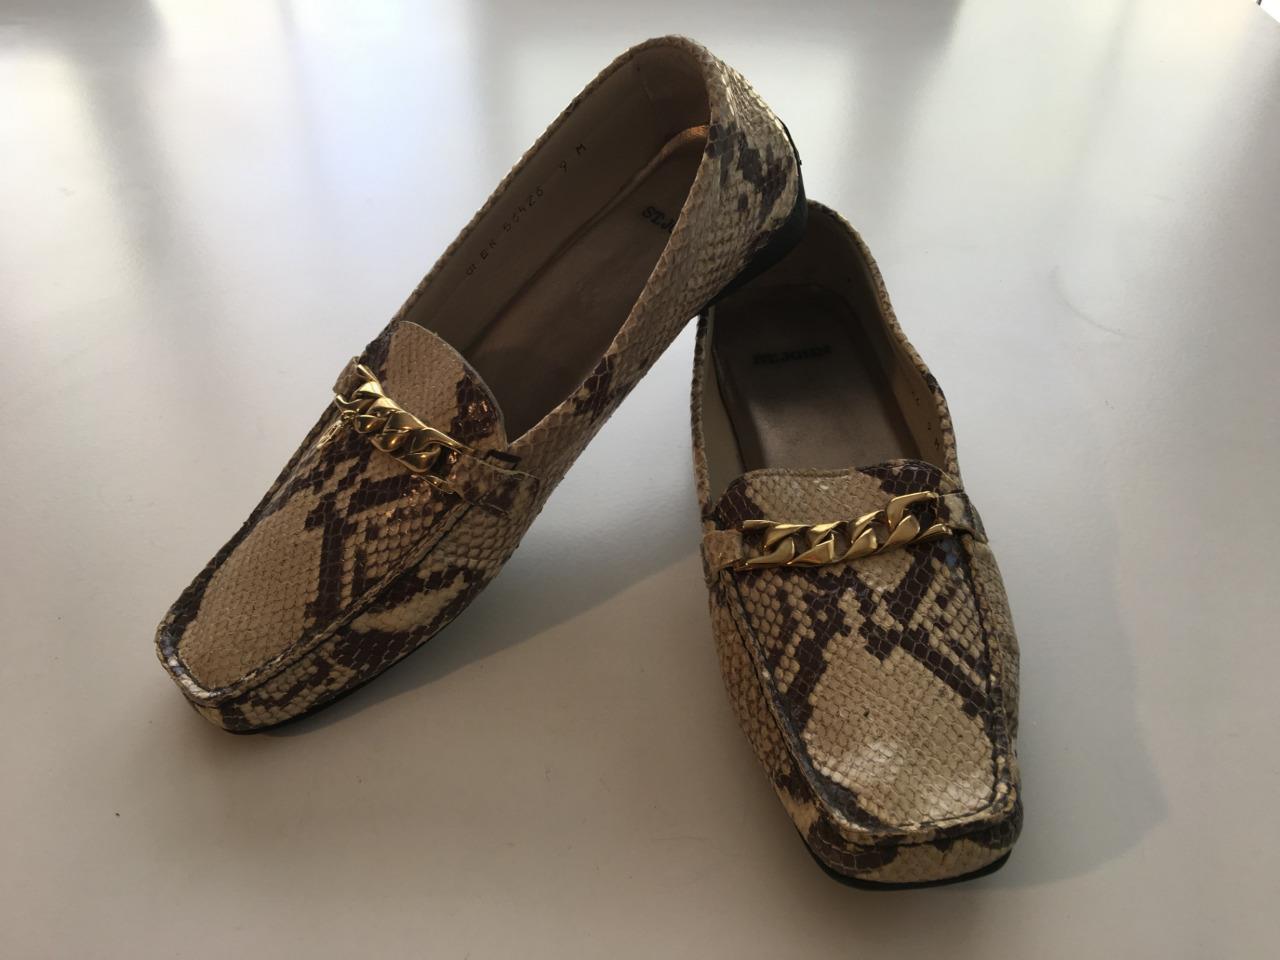 St John beige marron chaîne serpent détails chaussures mocassins Sz 9